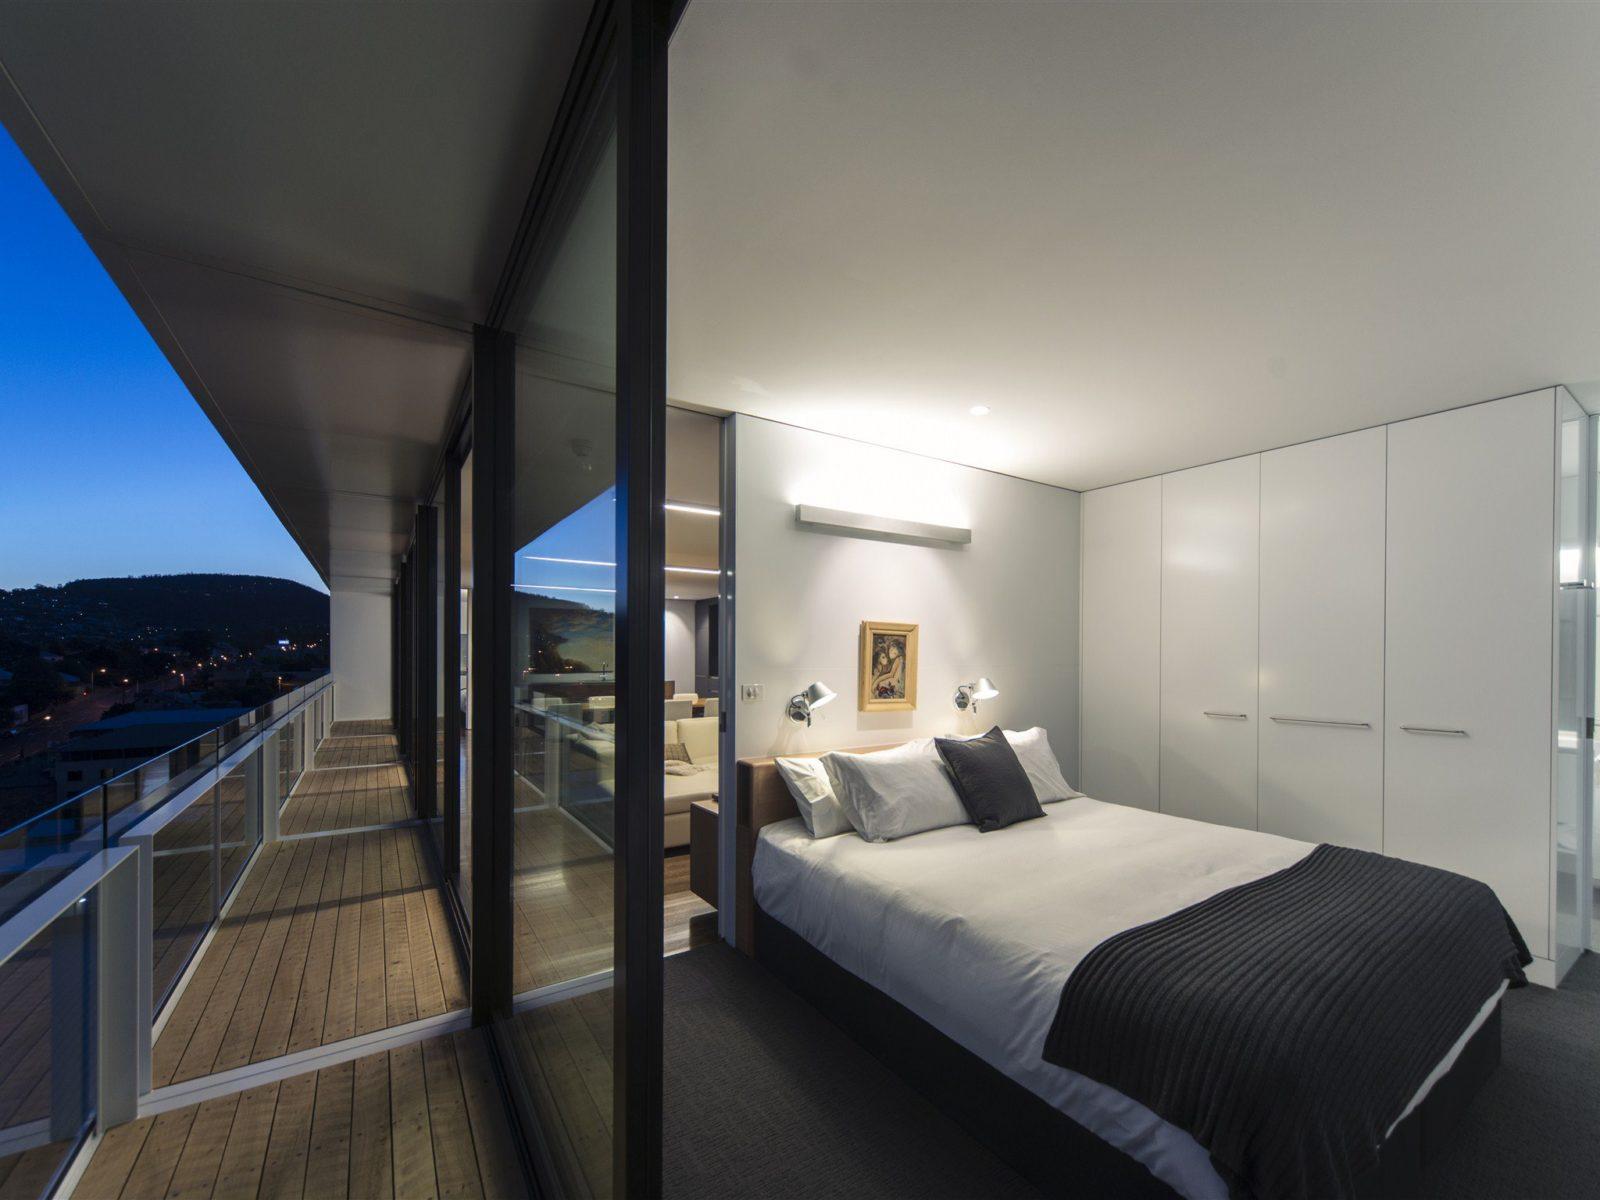 Bedroom at twilight